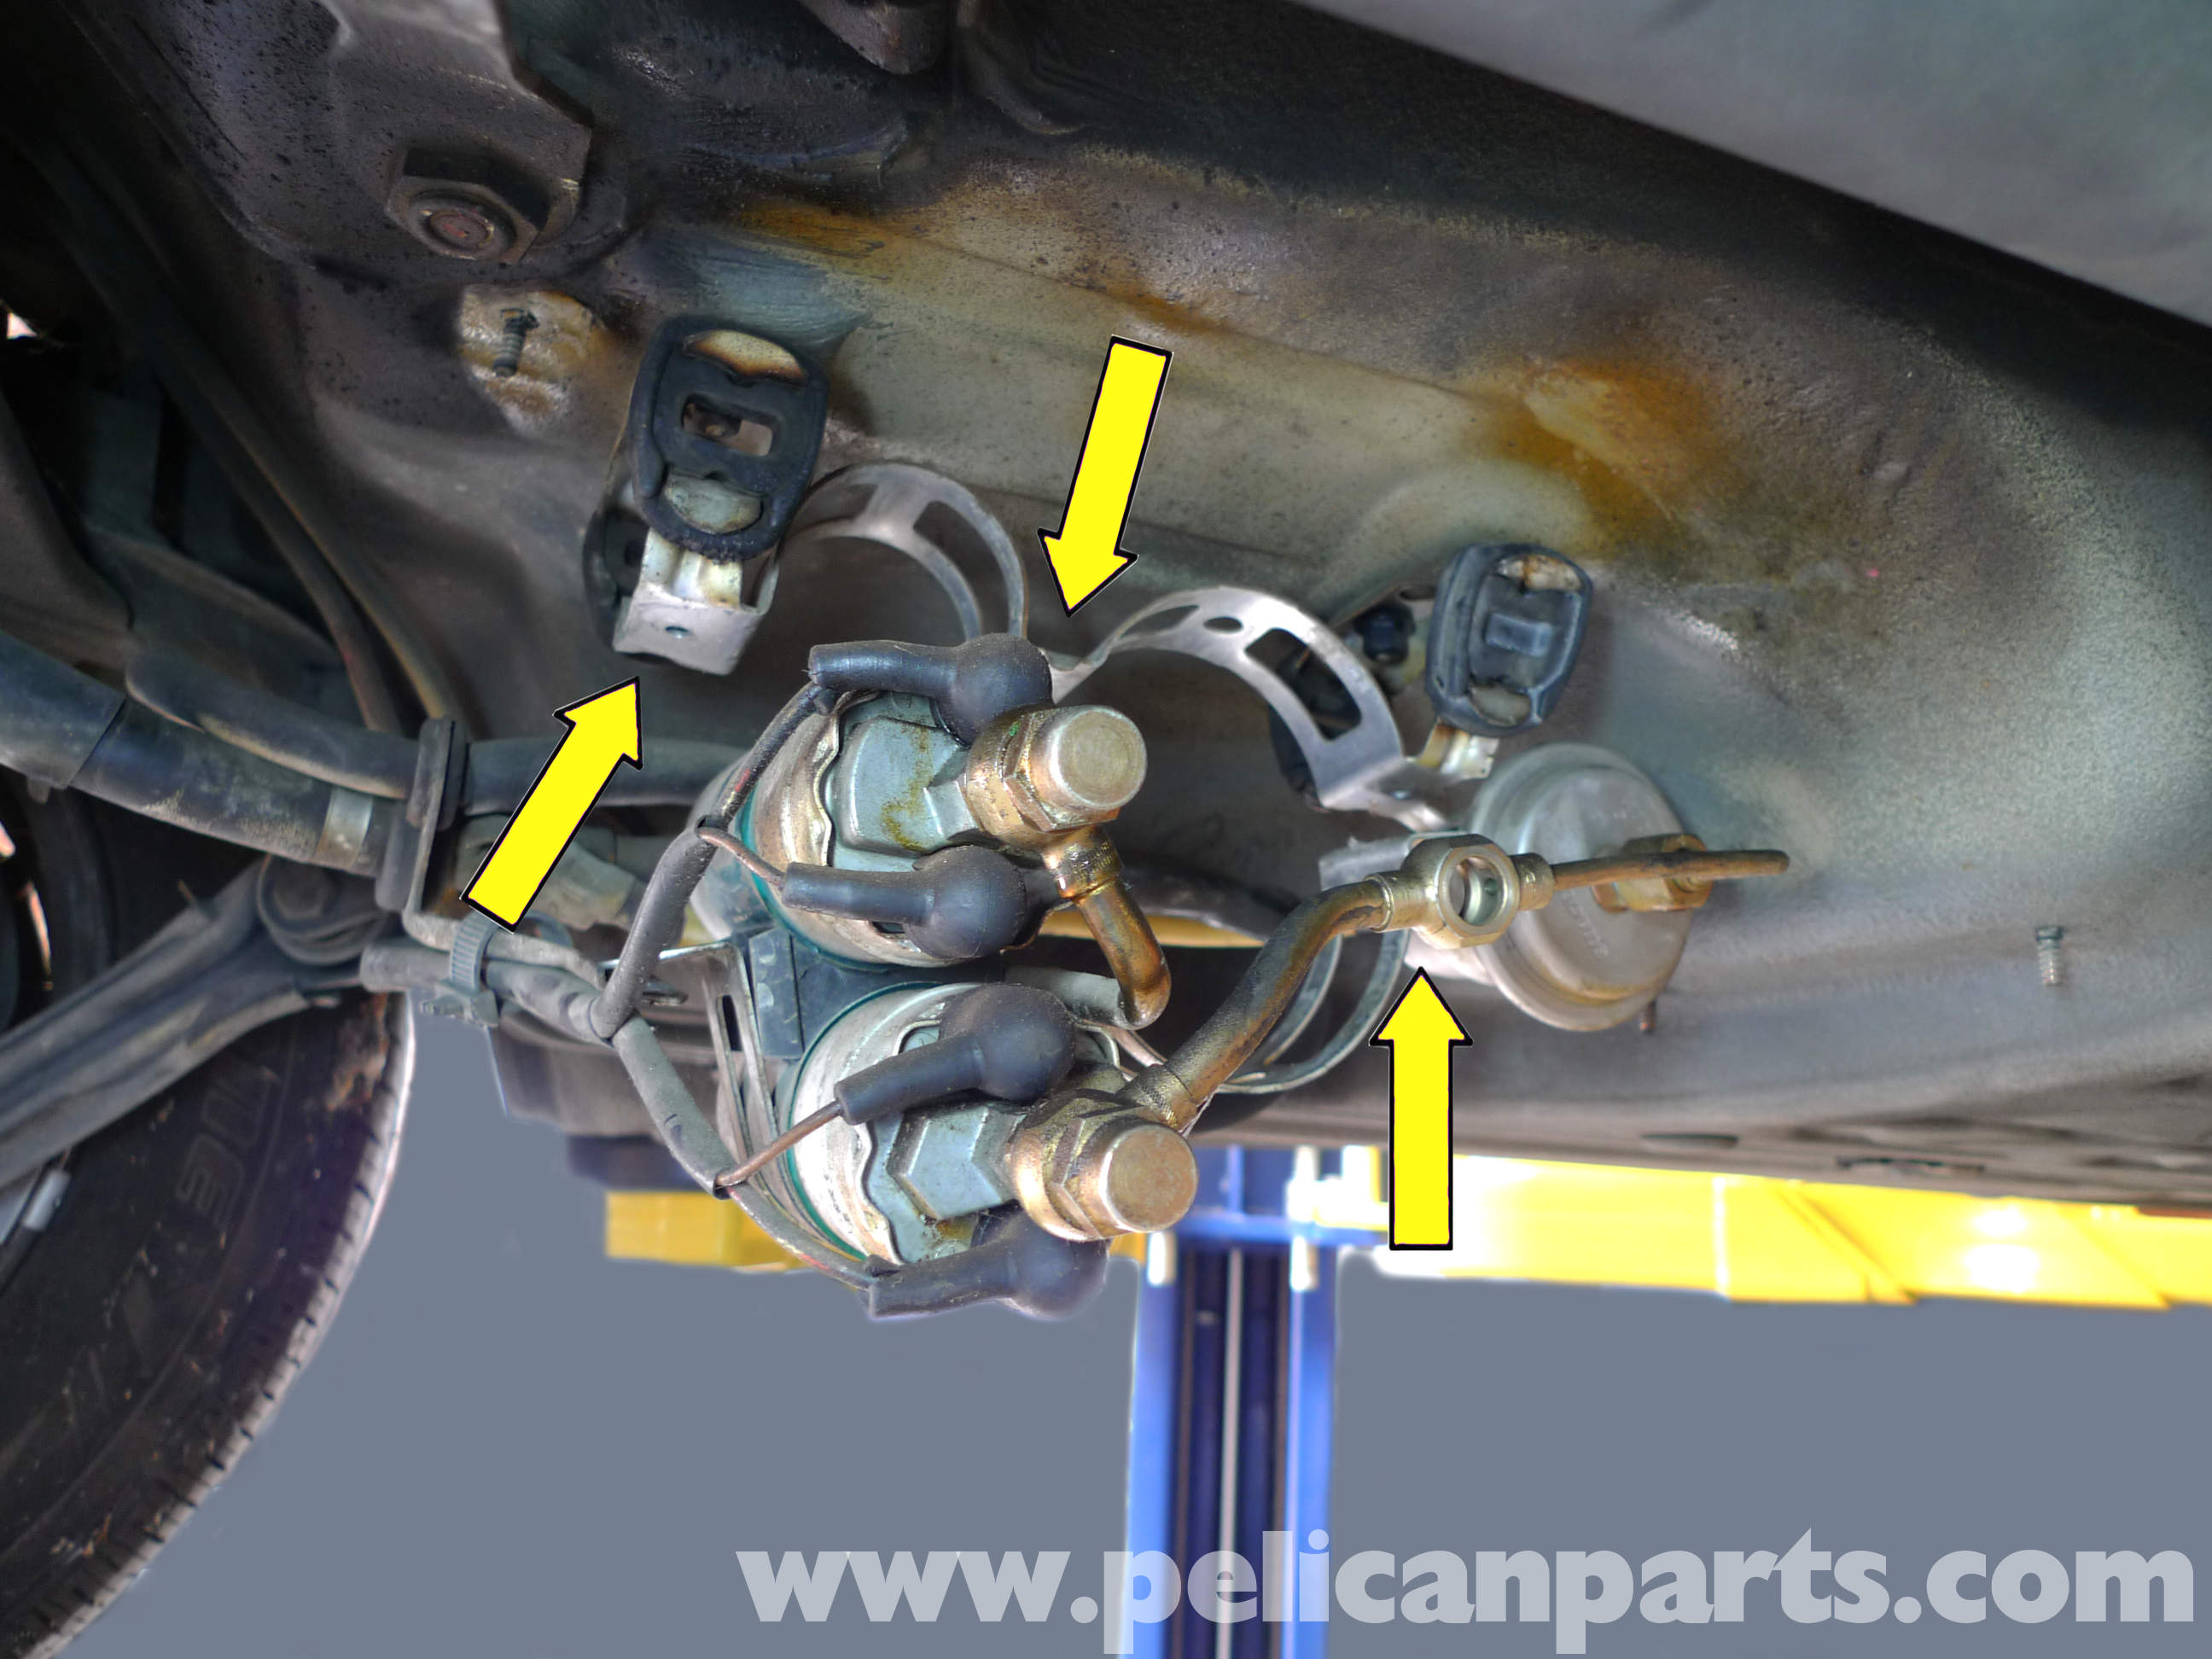 Mercedes benz 190e fuel filter replacement w201 1987 1993 pelican parts diy maintenance article